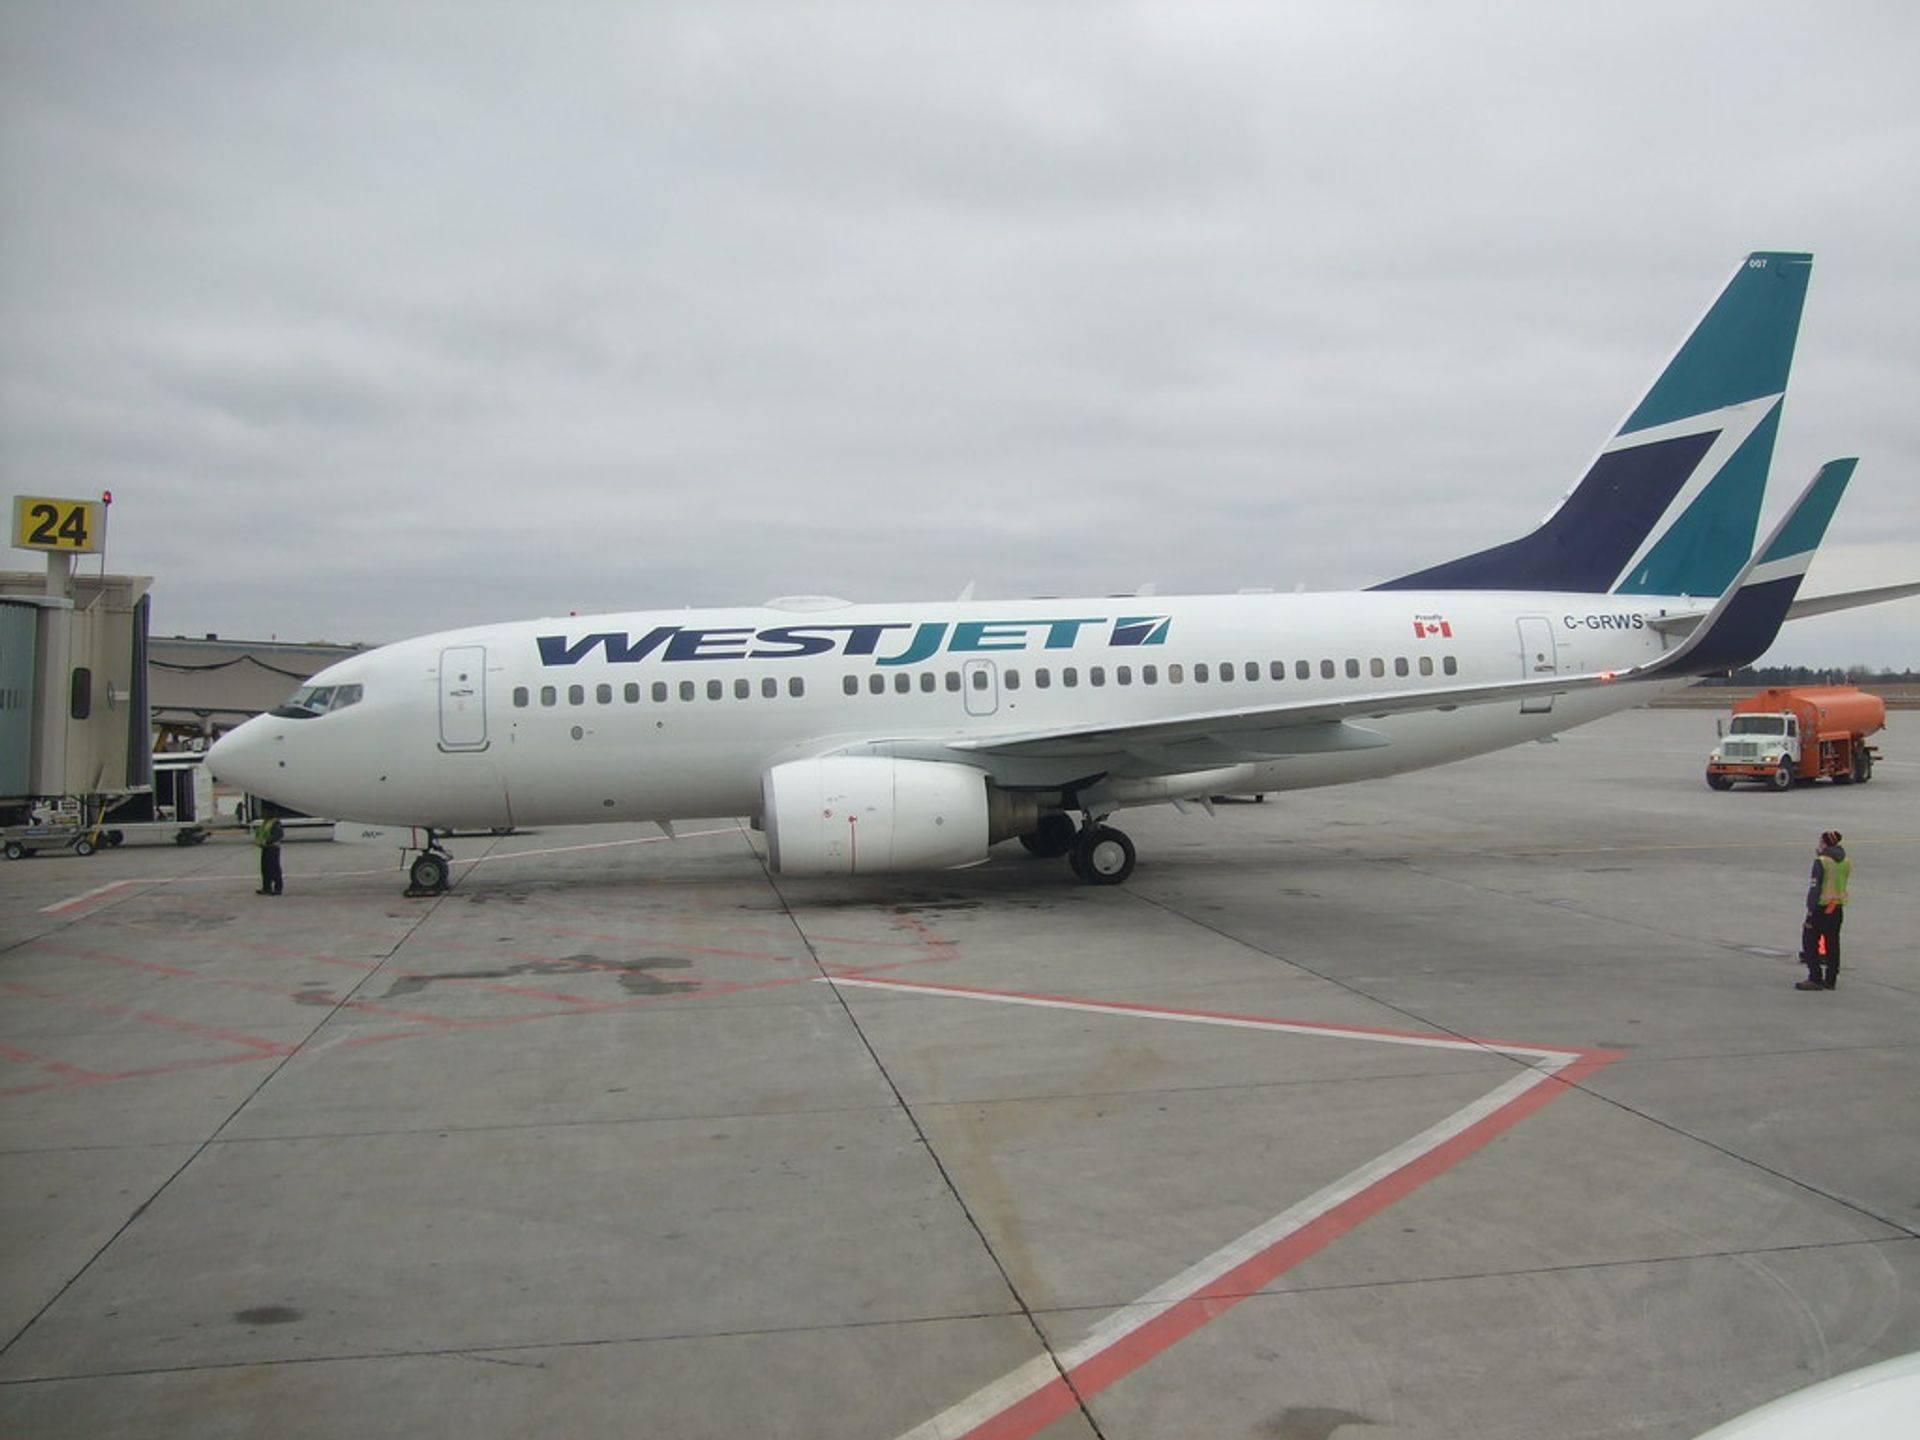 West Jet Departing YVR